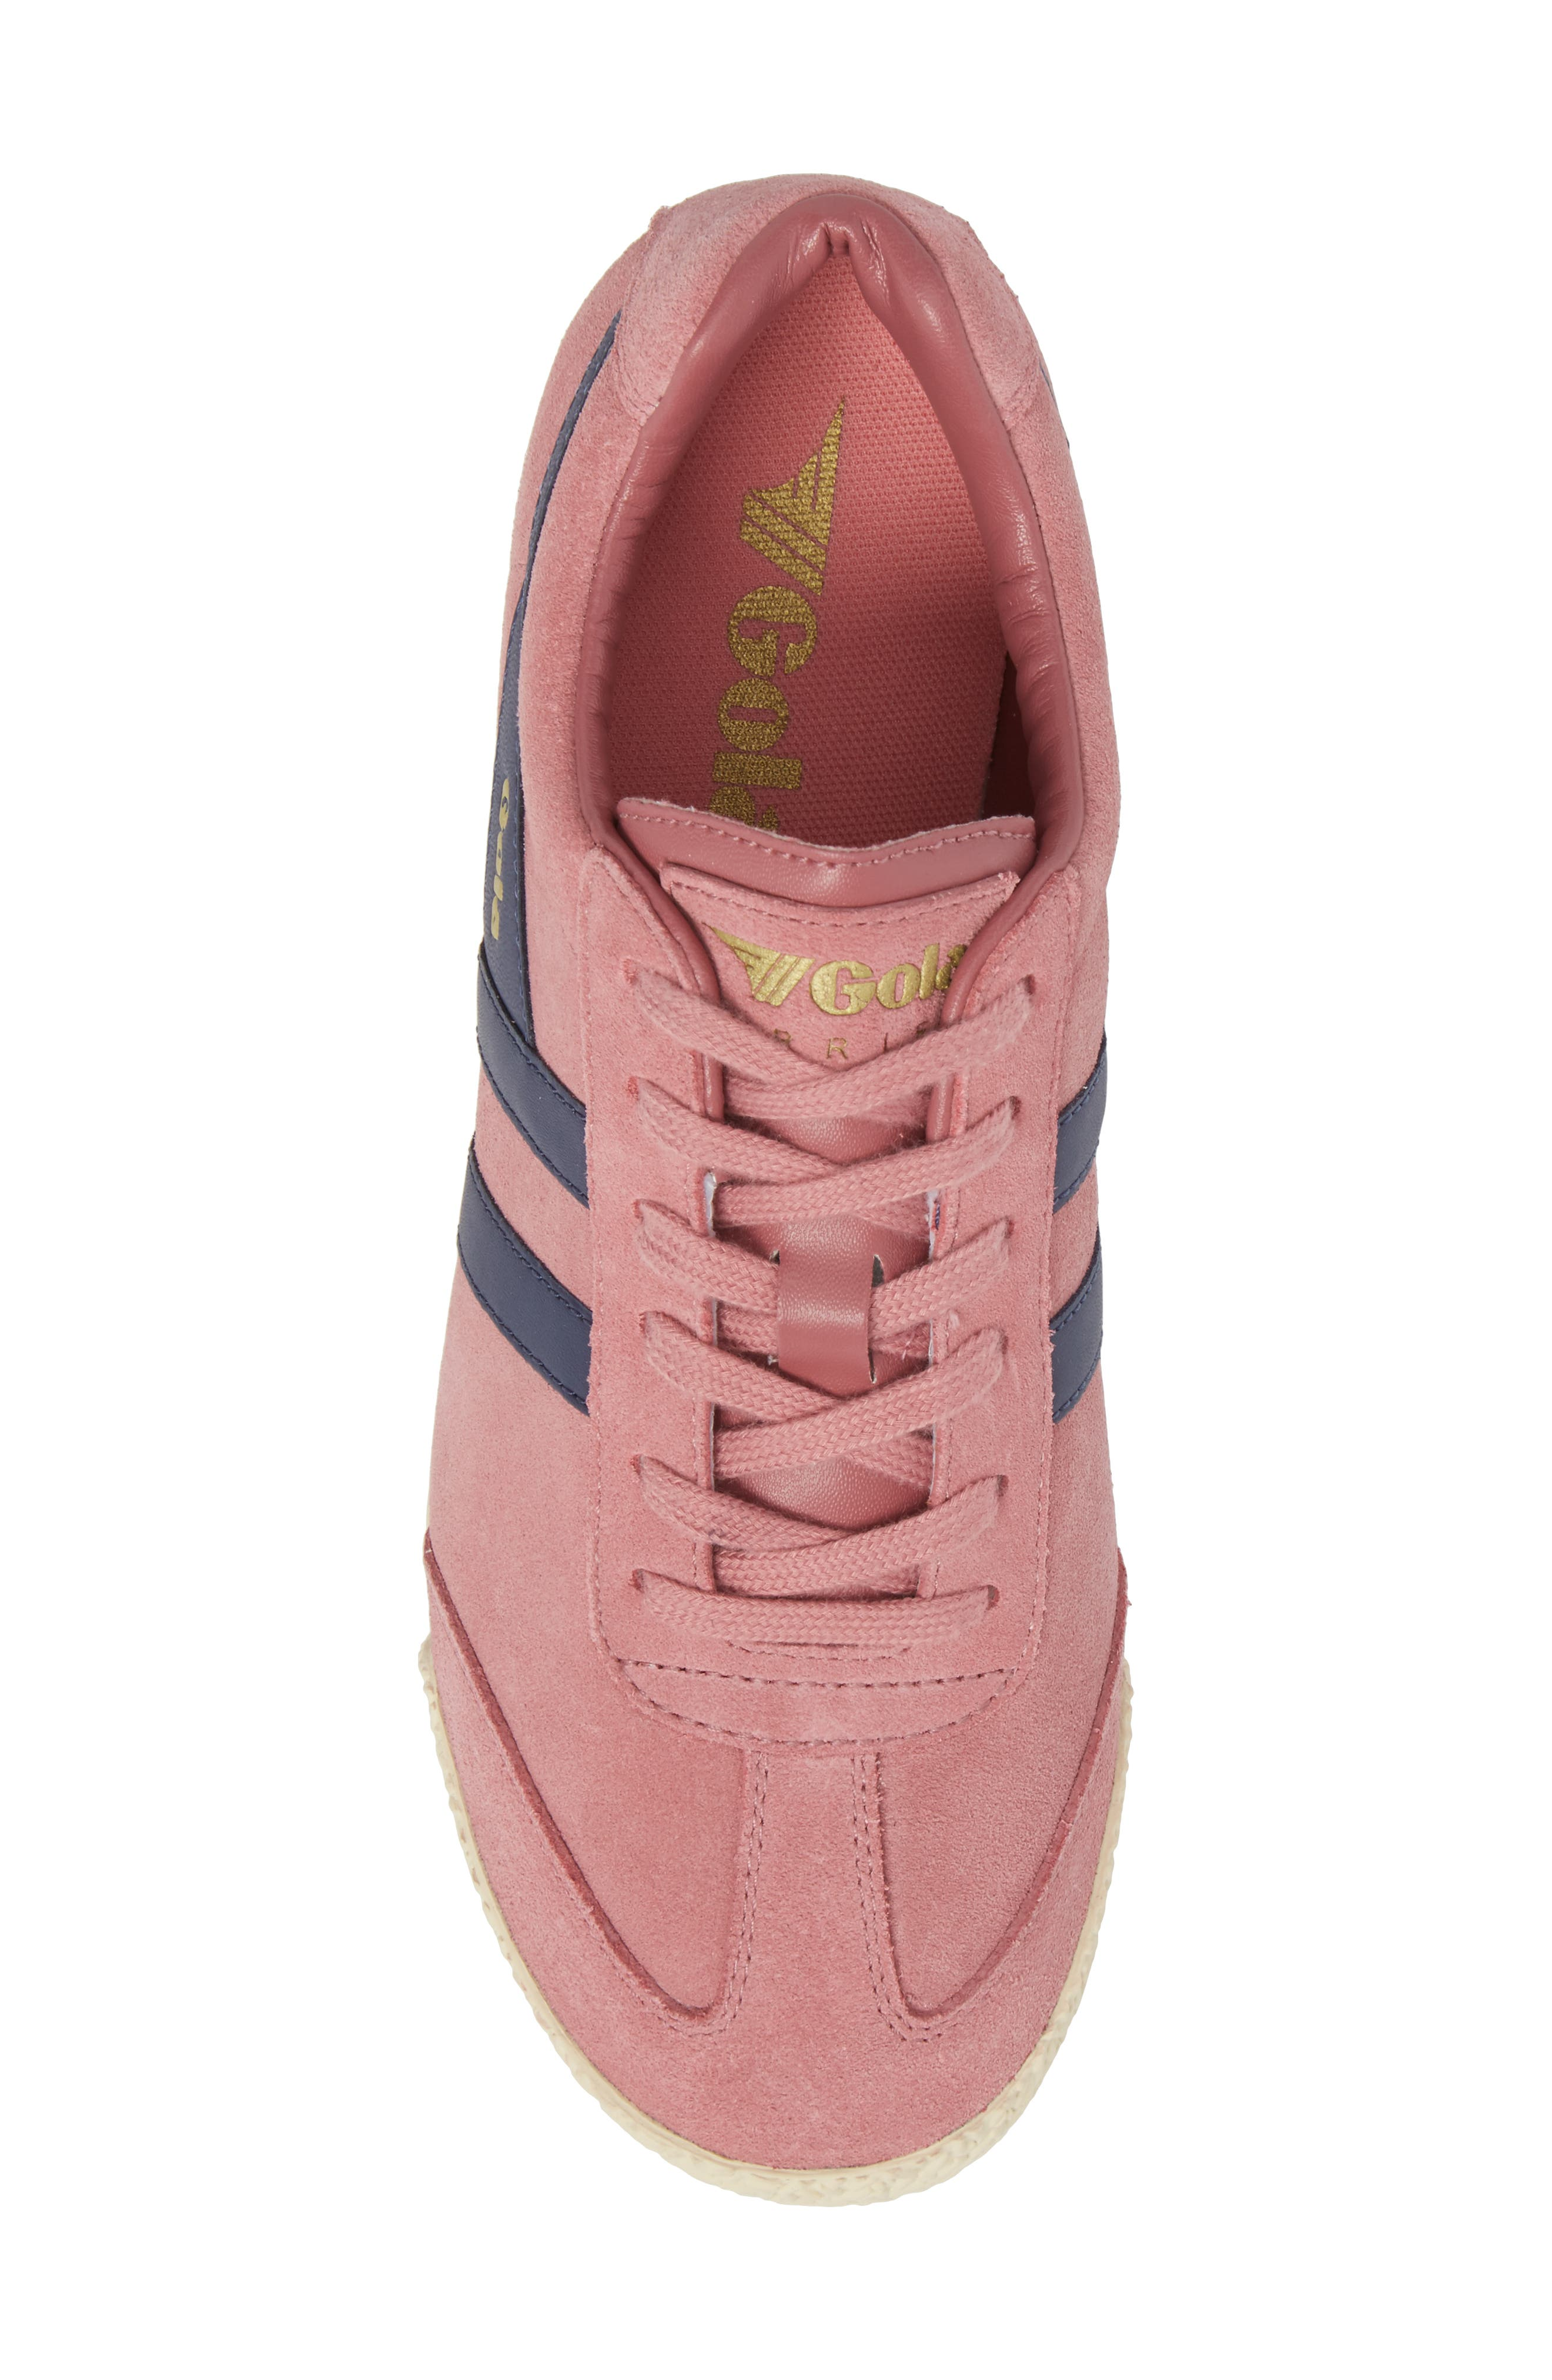 Harrier Suede Low Top Sneaker,                             Alternate thumbnail 5, color,                             Dusty Rose/ Navy